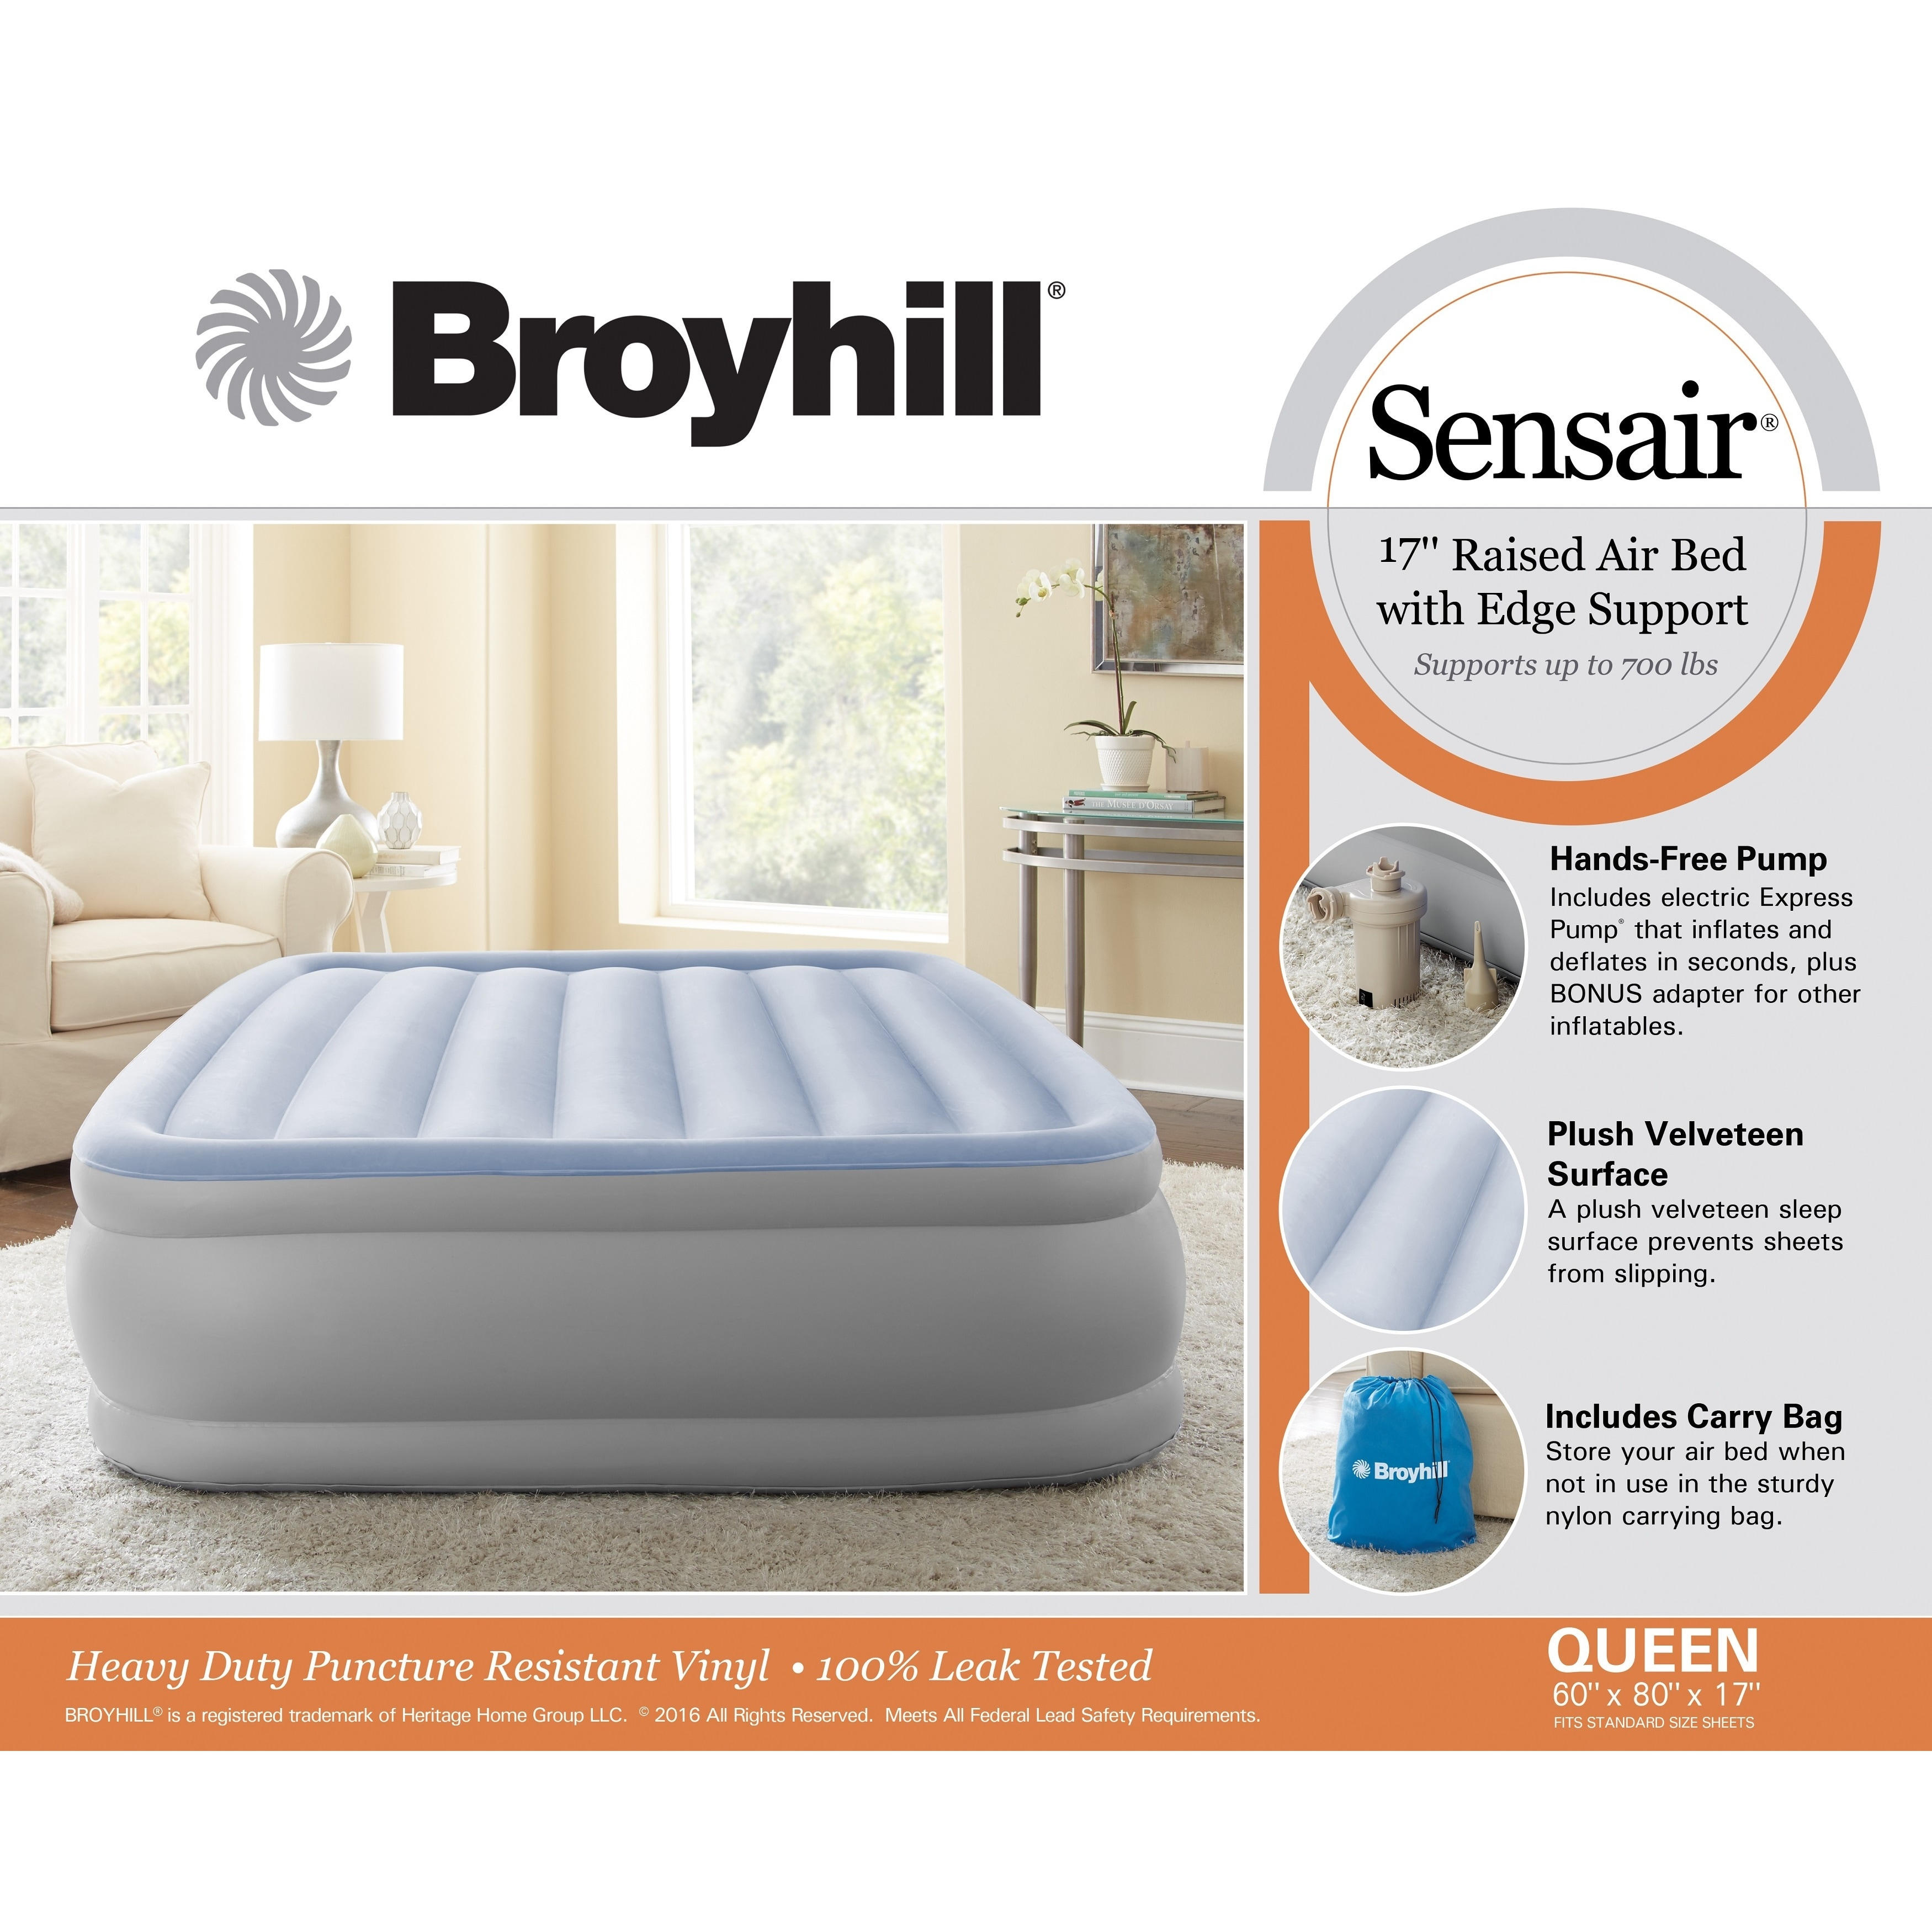 hei double herol bed queen aerobed sale classic air wid mattress high